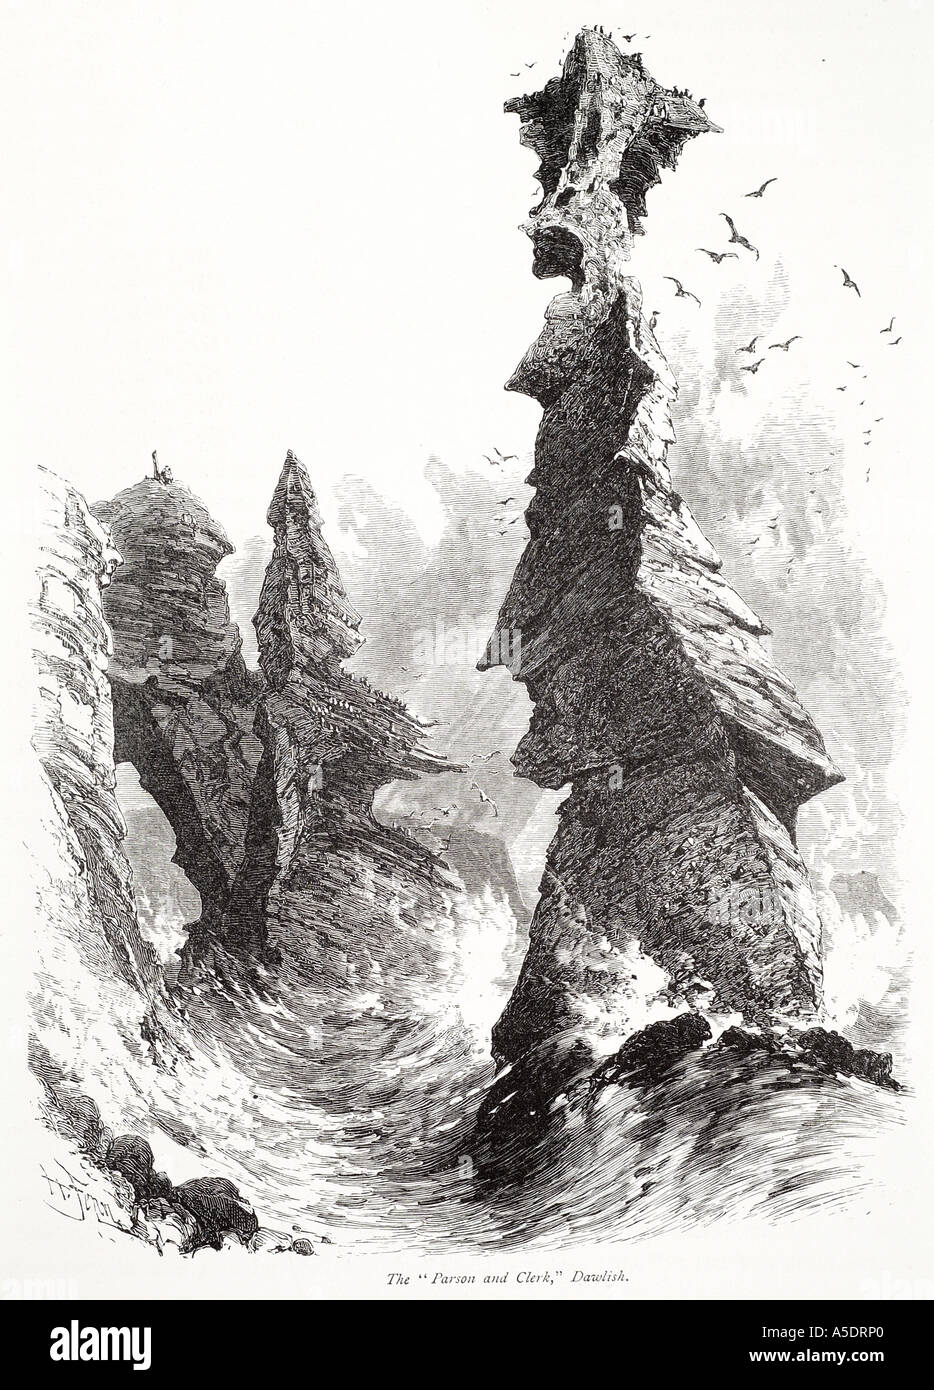 parson clerk dawlish rock spire chimney devon south coast marine wave erosion geology sea water England English UK GB United Kin - Stock Image